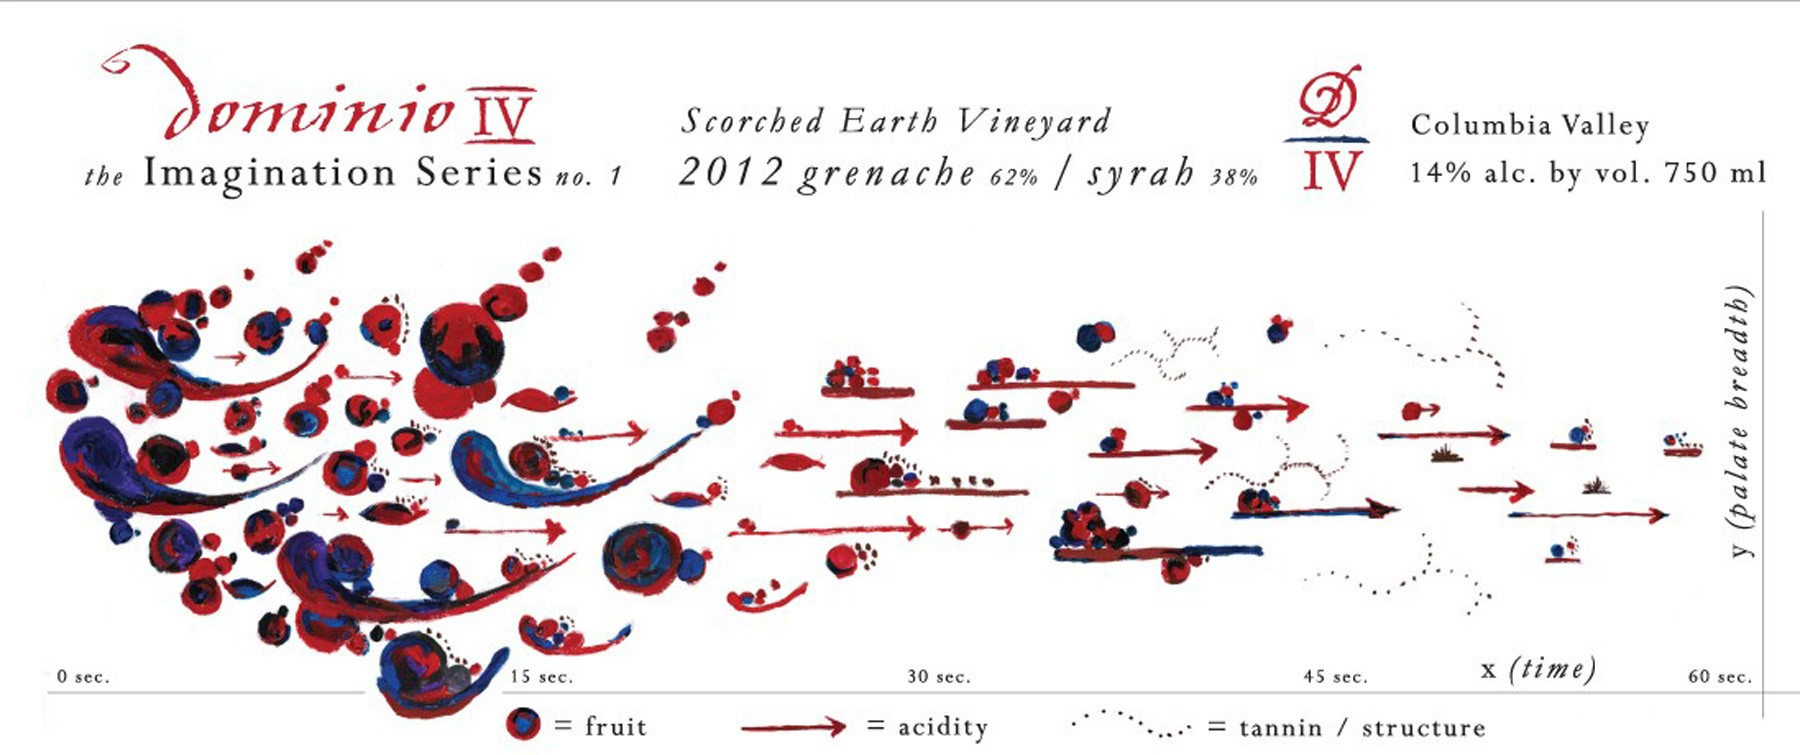 Image courtesy of Dominio IV Wines